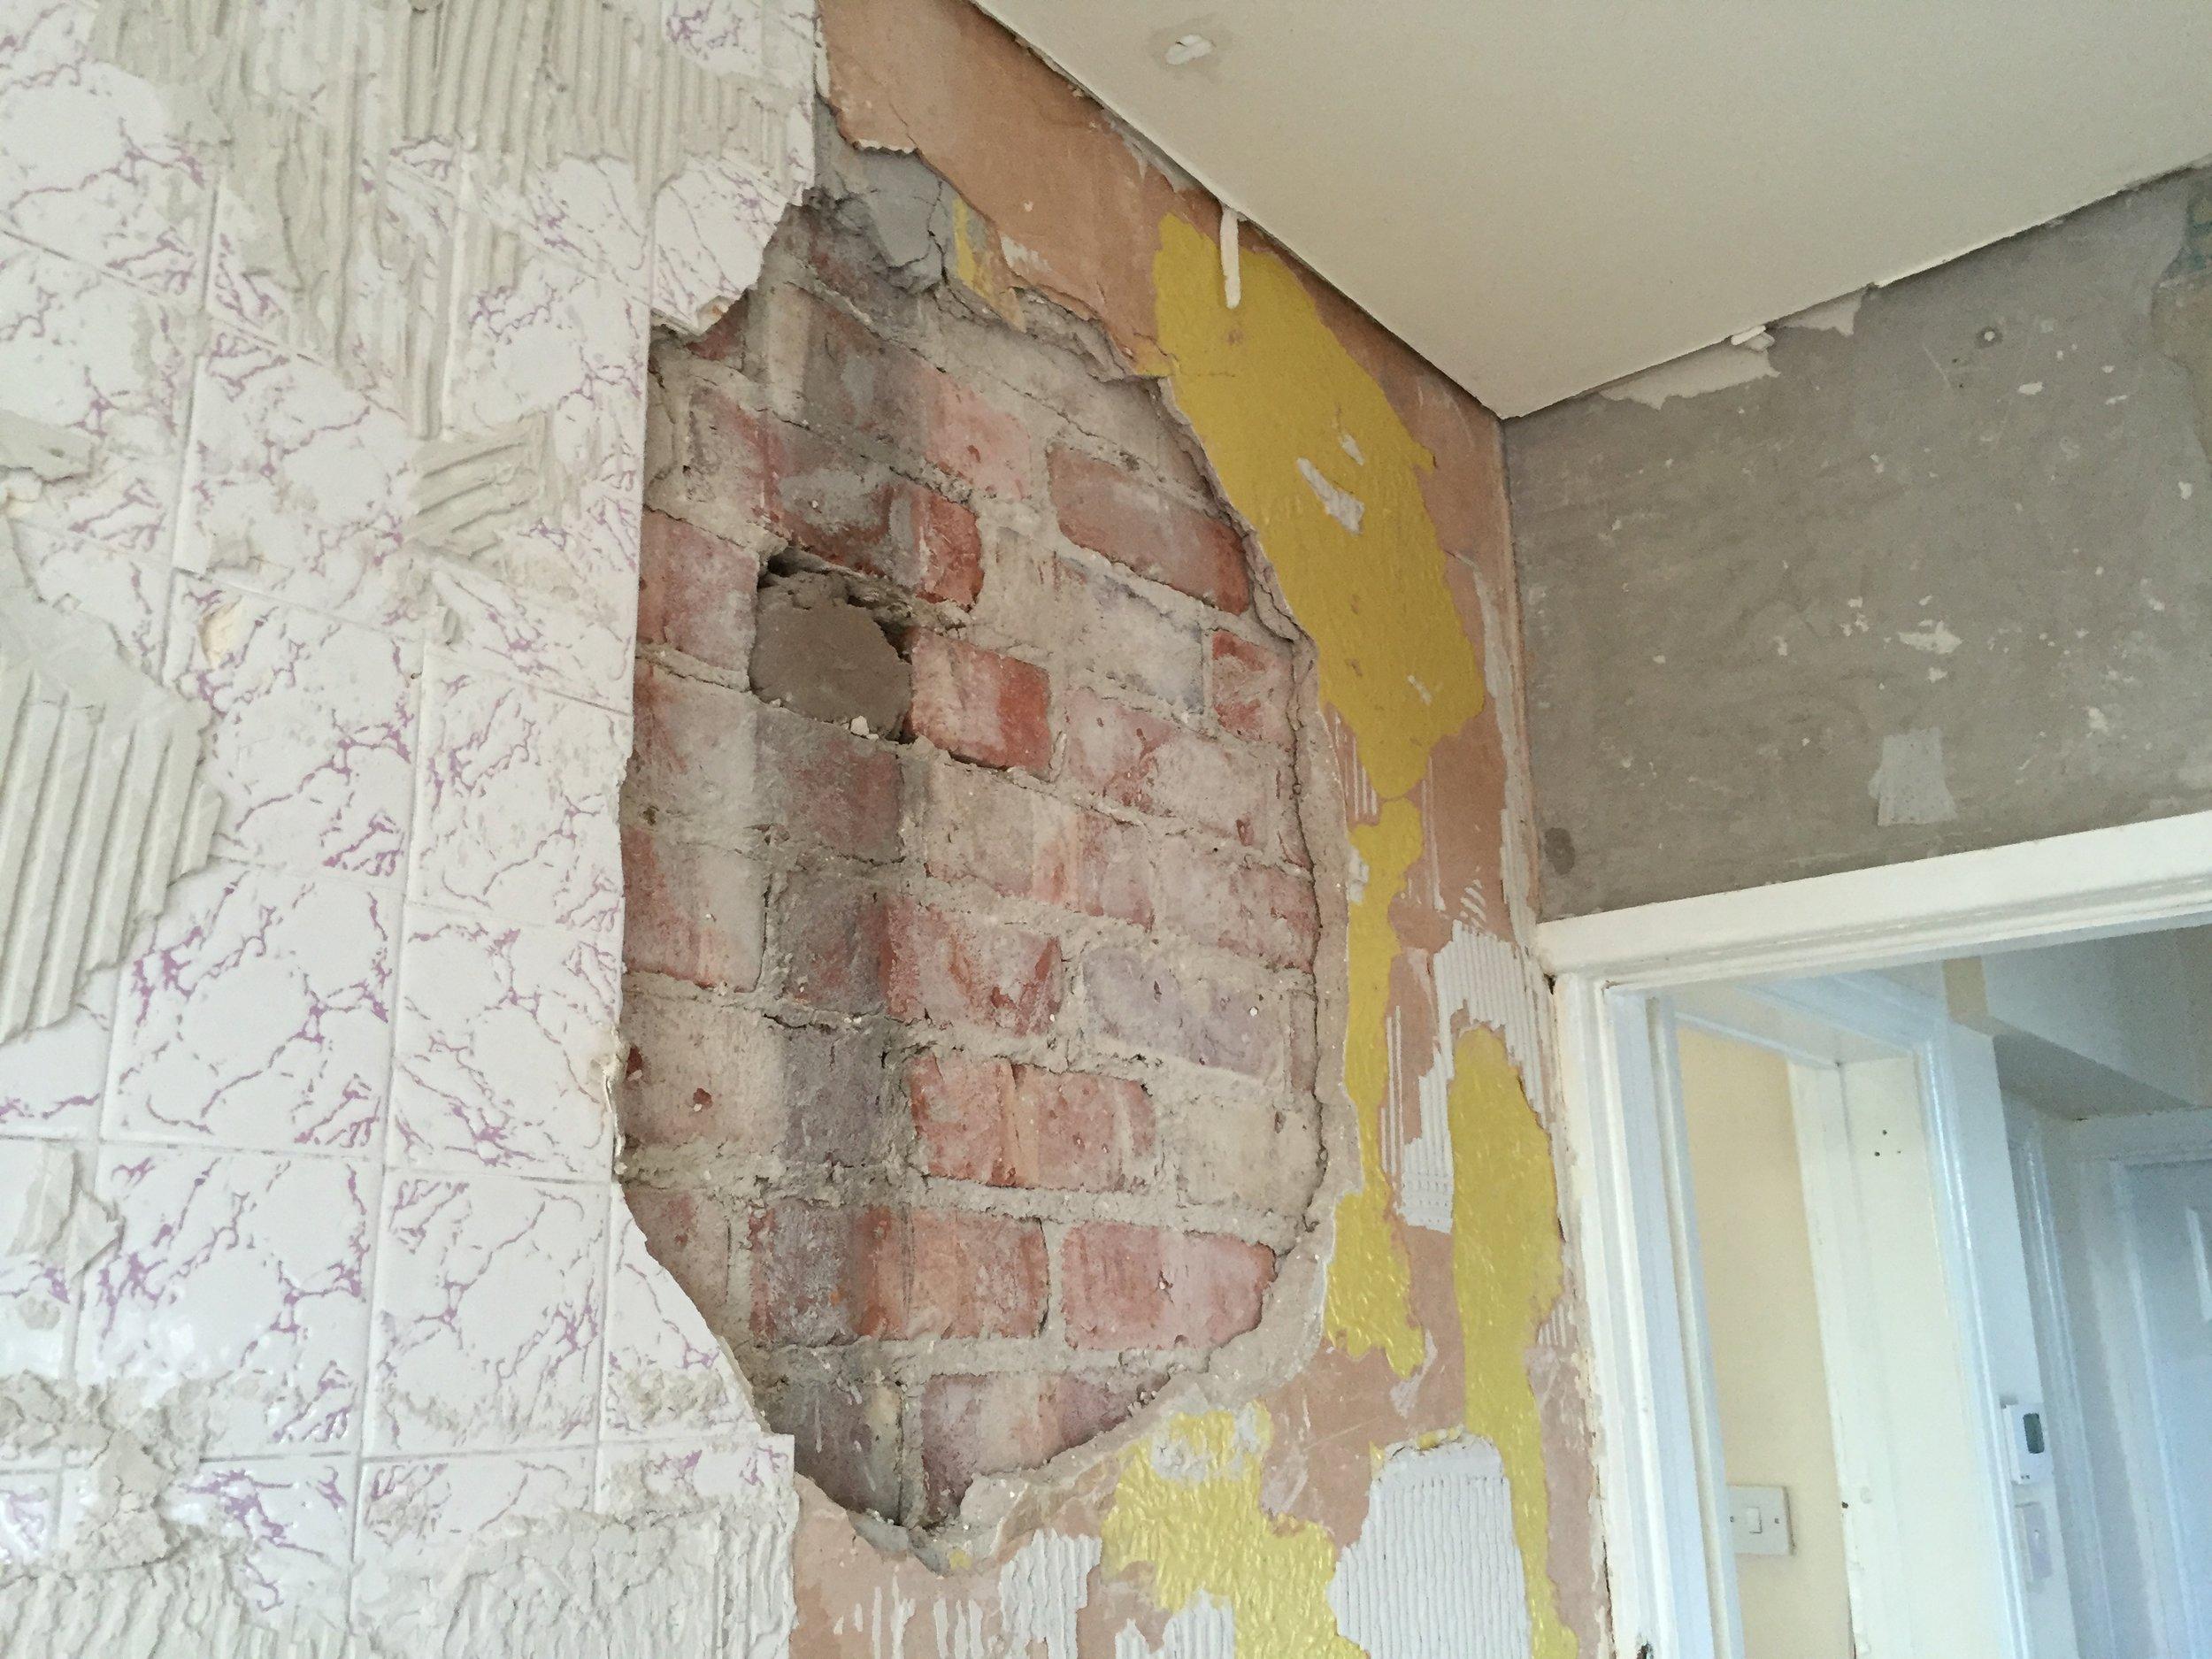 More wall tiles - long past retirement